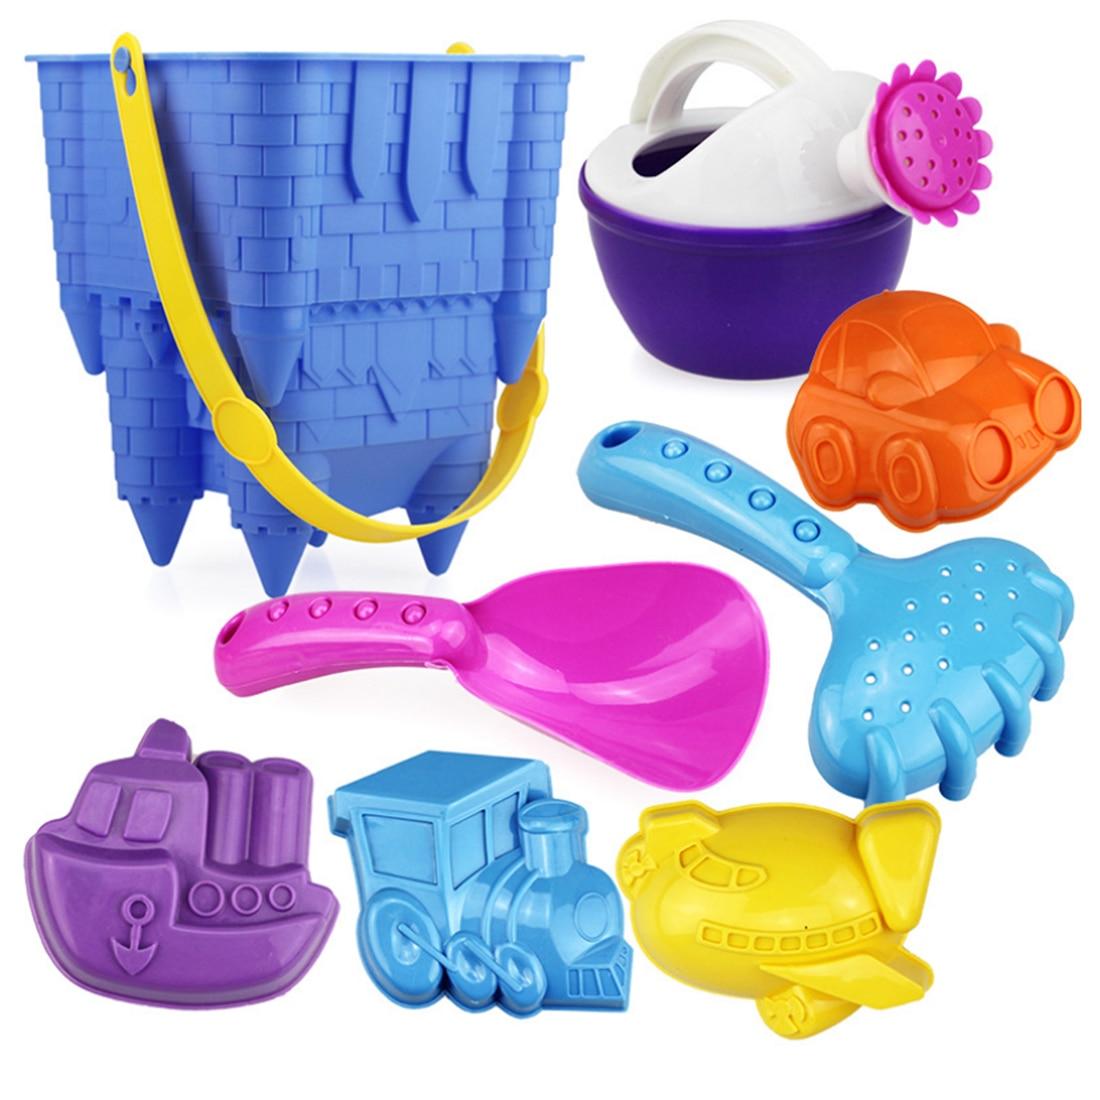 8Pcs Summer Beach Toy Set Castle Bucket Shovel Children Safety Fancy Toys Outdoor Kids Beach Sand Toys Set - Color Random